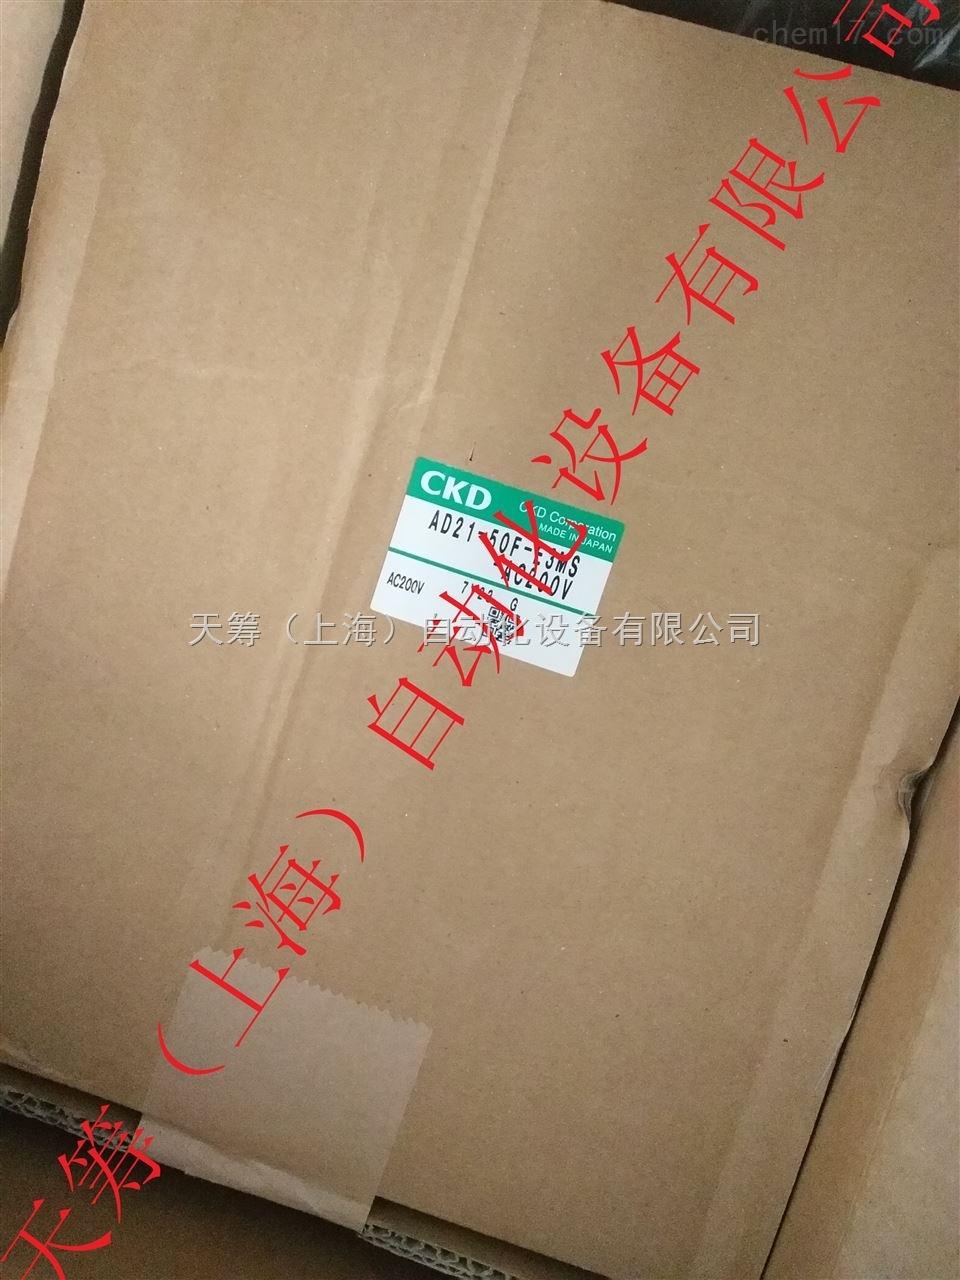 日本CKD电磁阀AD21-50F-E3MS-AC220V